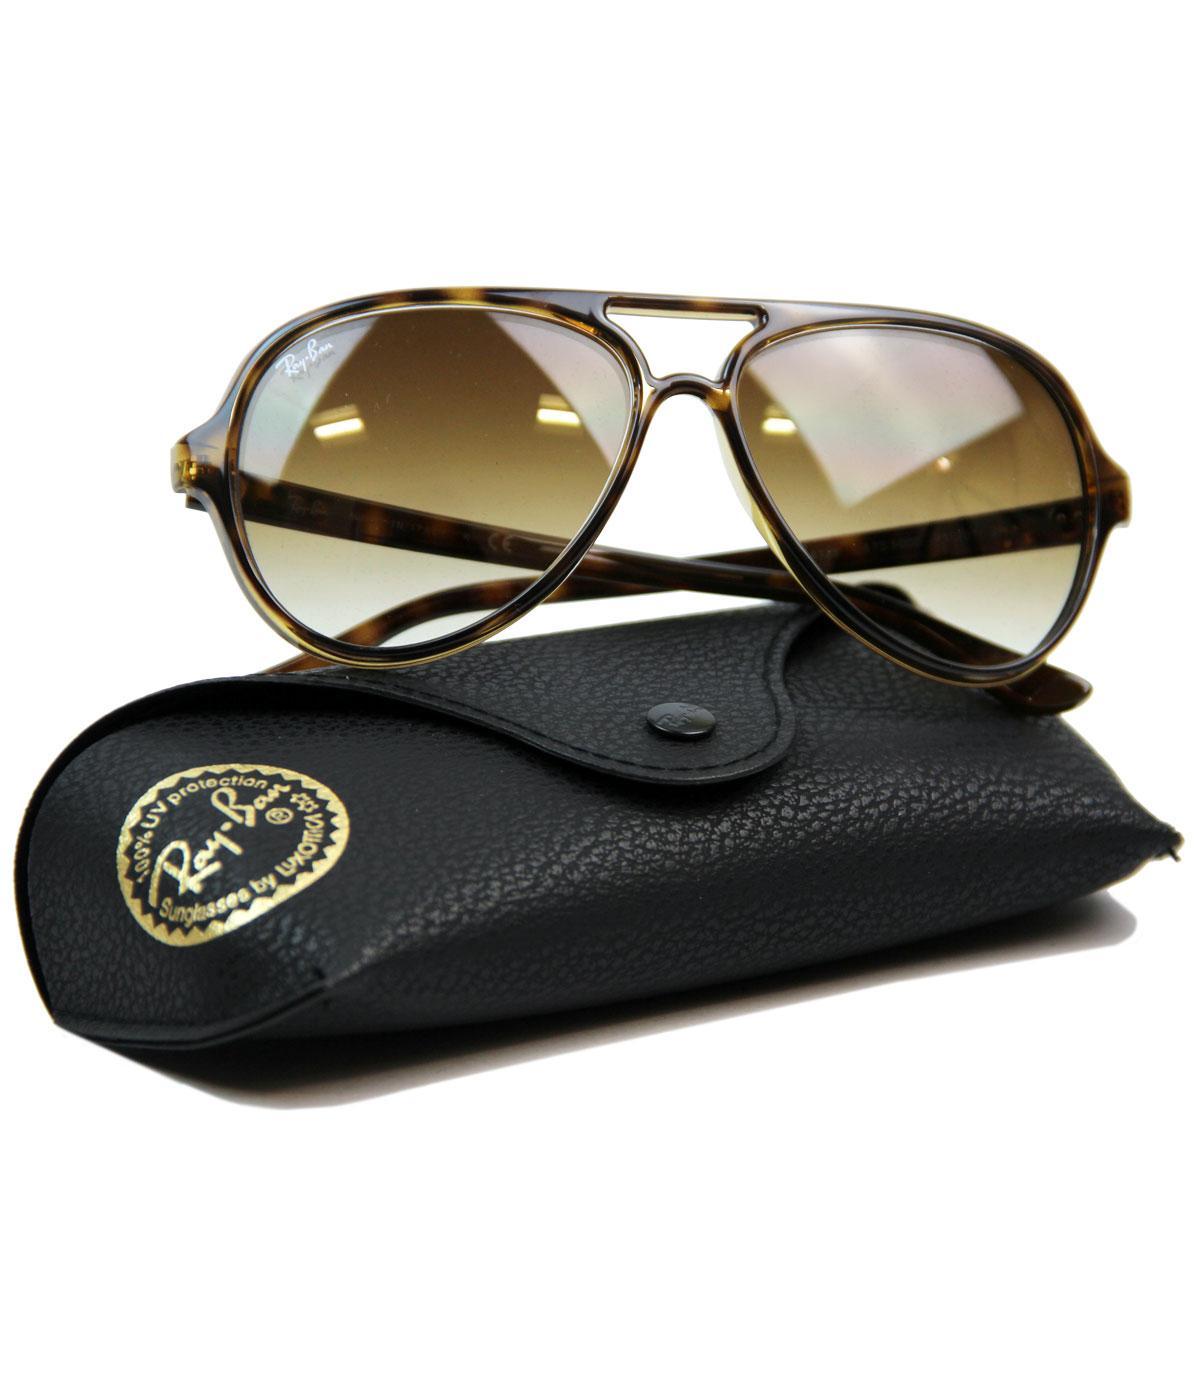 012d0c0b288 Cats 5000 Ray-Ban Retro Mod Aviator Sunglasses LH